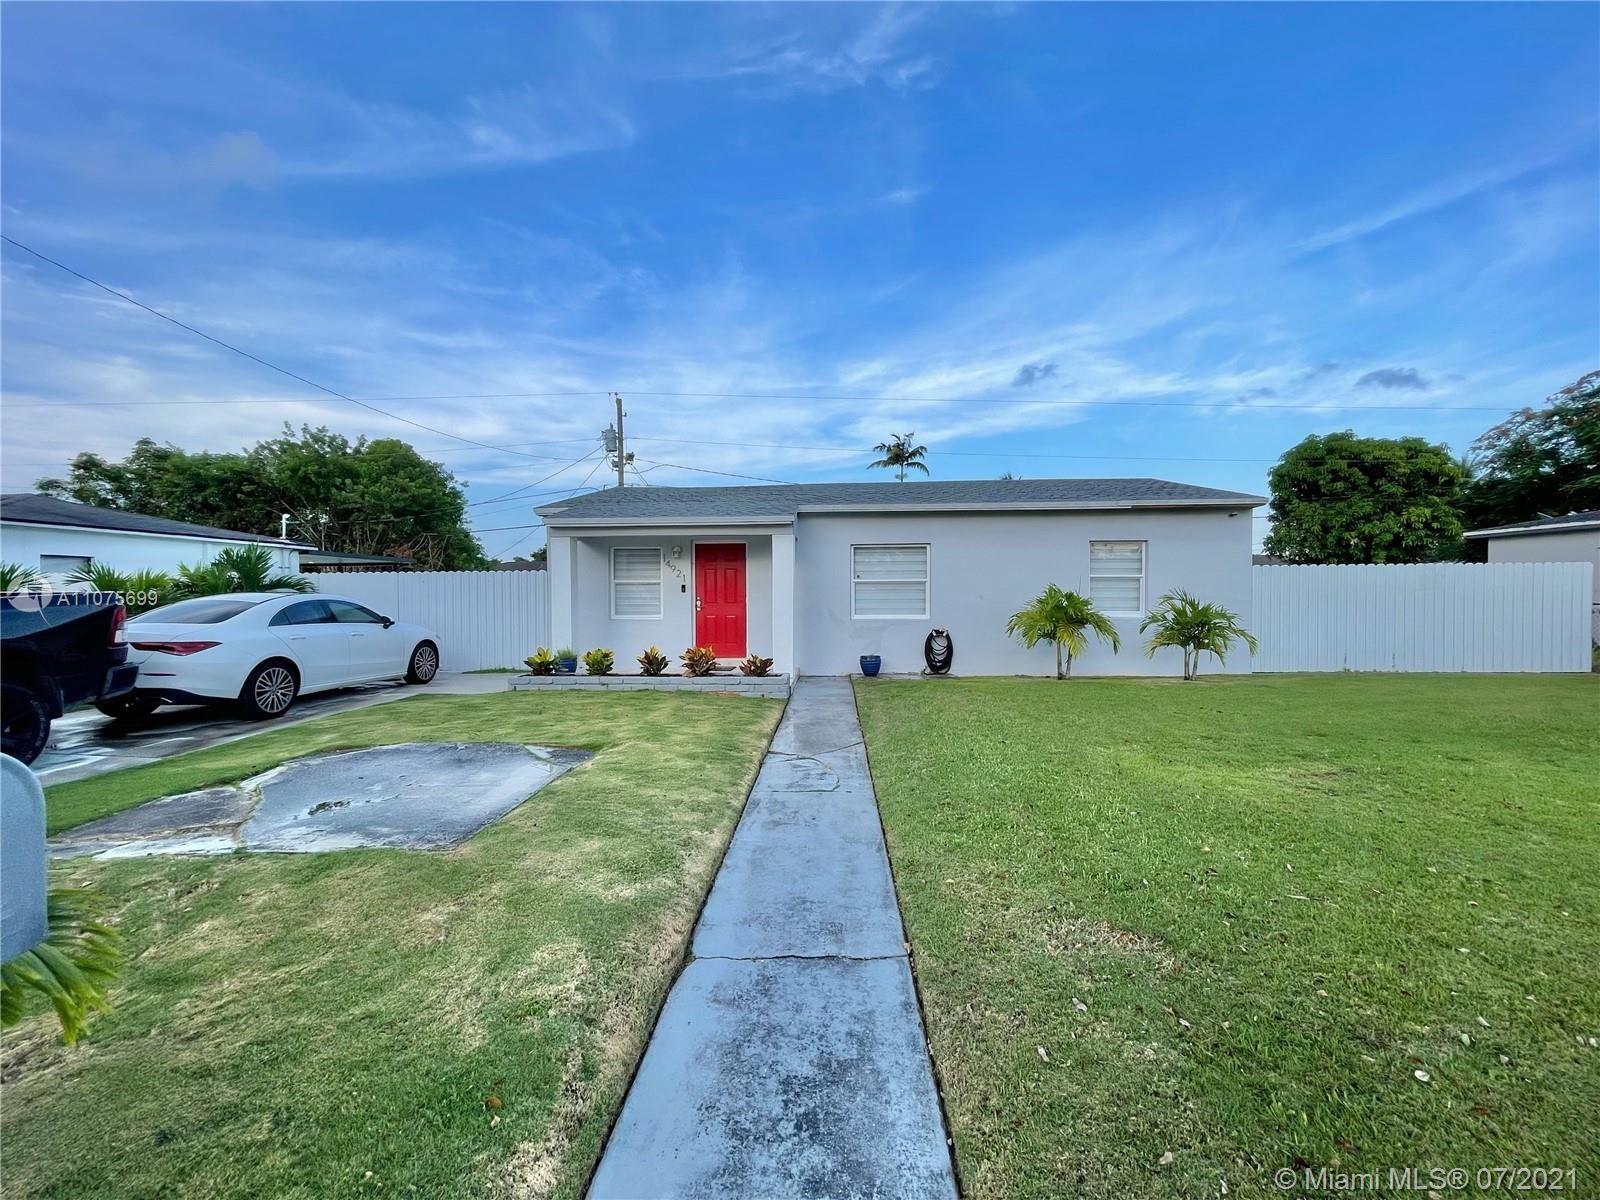 Photo of 14921 Harrison St, Miami, FL 33176 (MLS # A11075699)